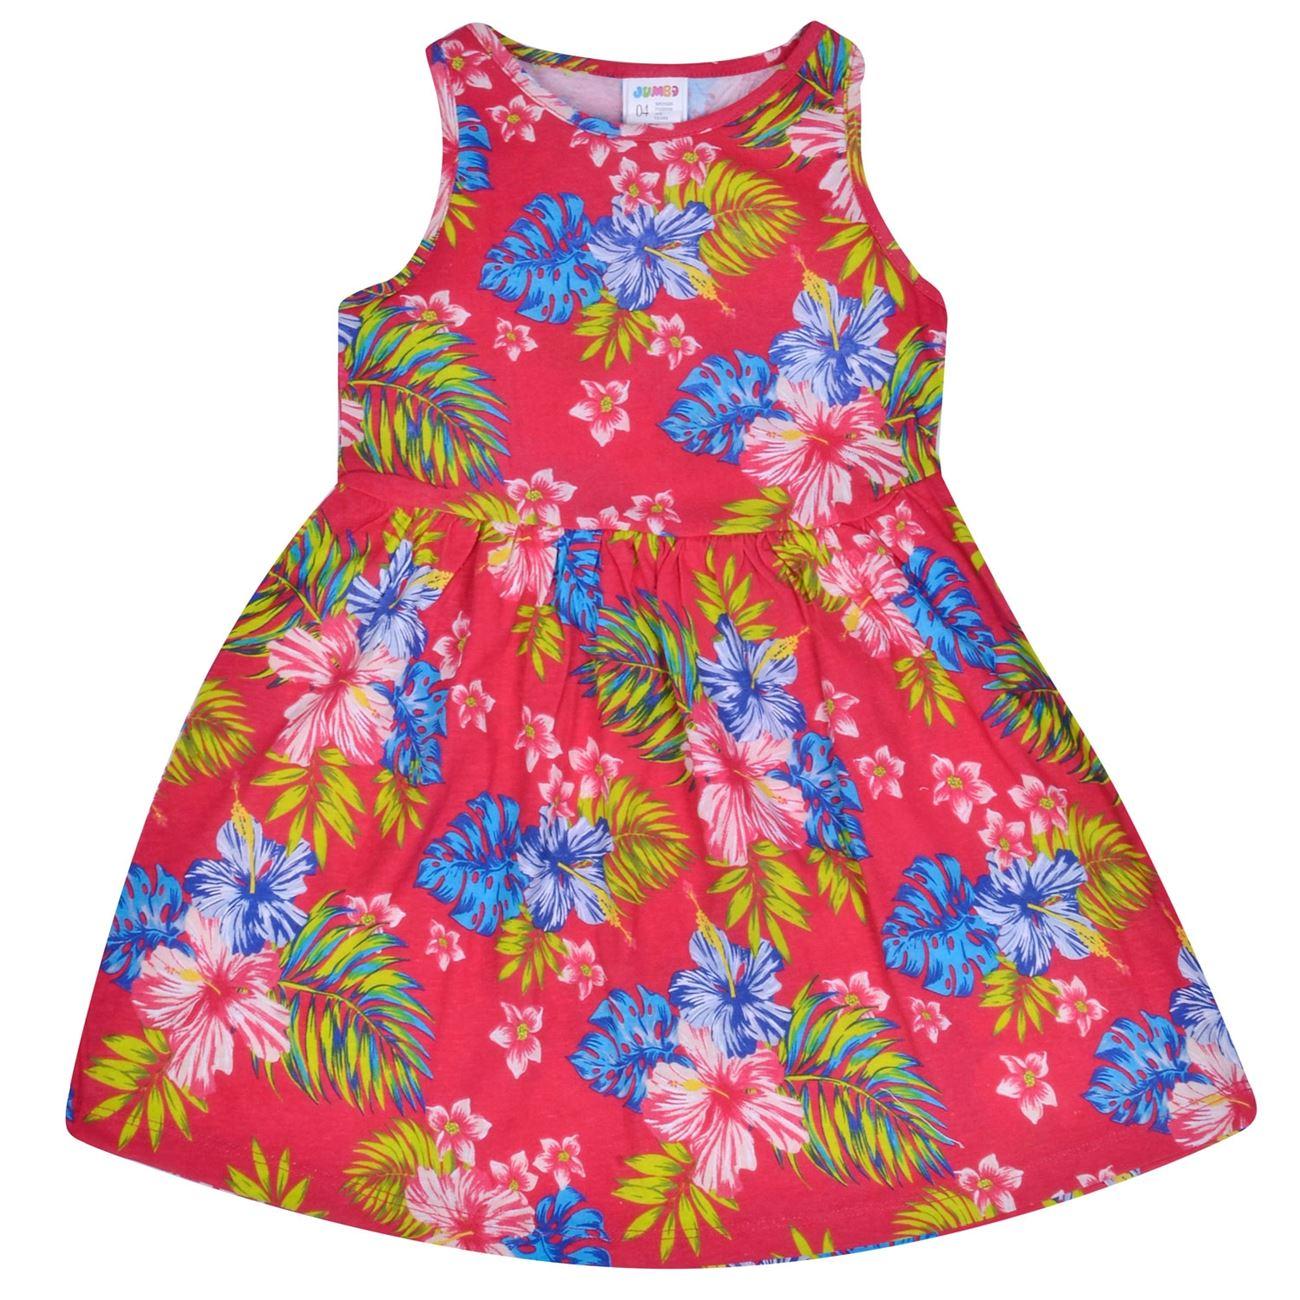 f725c529af4 Φόρεμα Αμάνικο Παιδικό Κόκκινο Εμπριμέ < Φορέματα για Κορίτσια | Jumbo